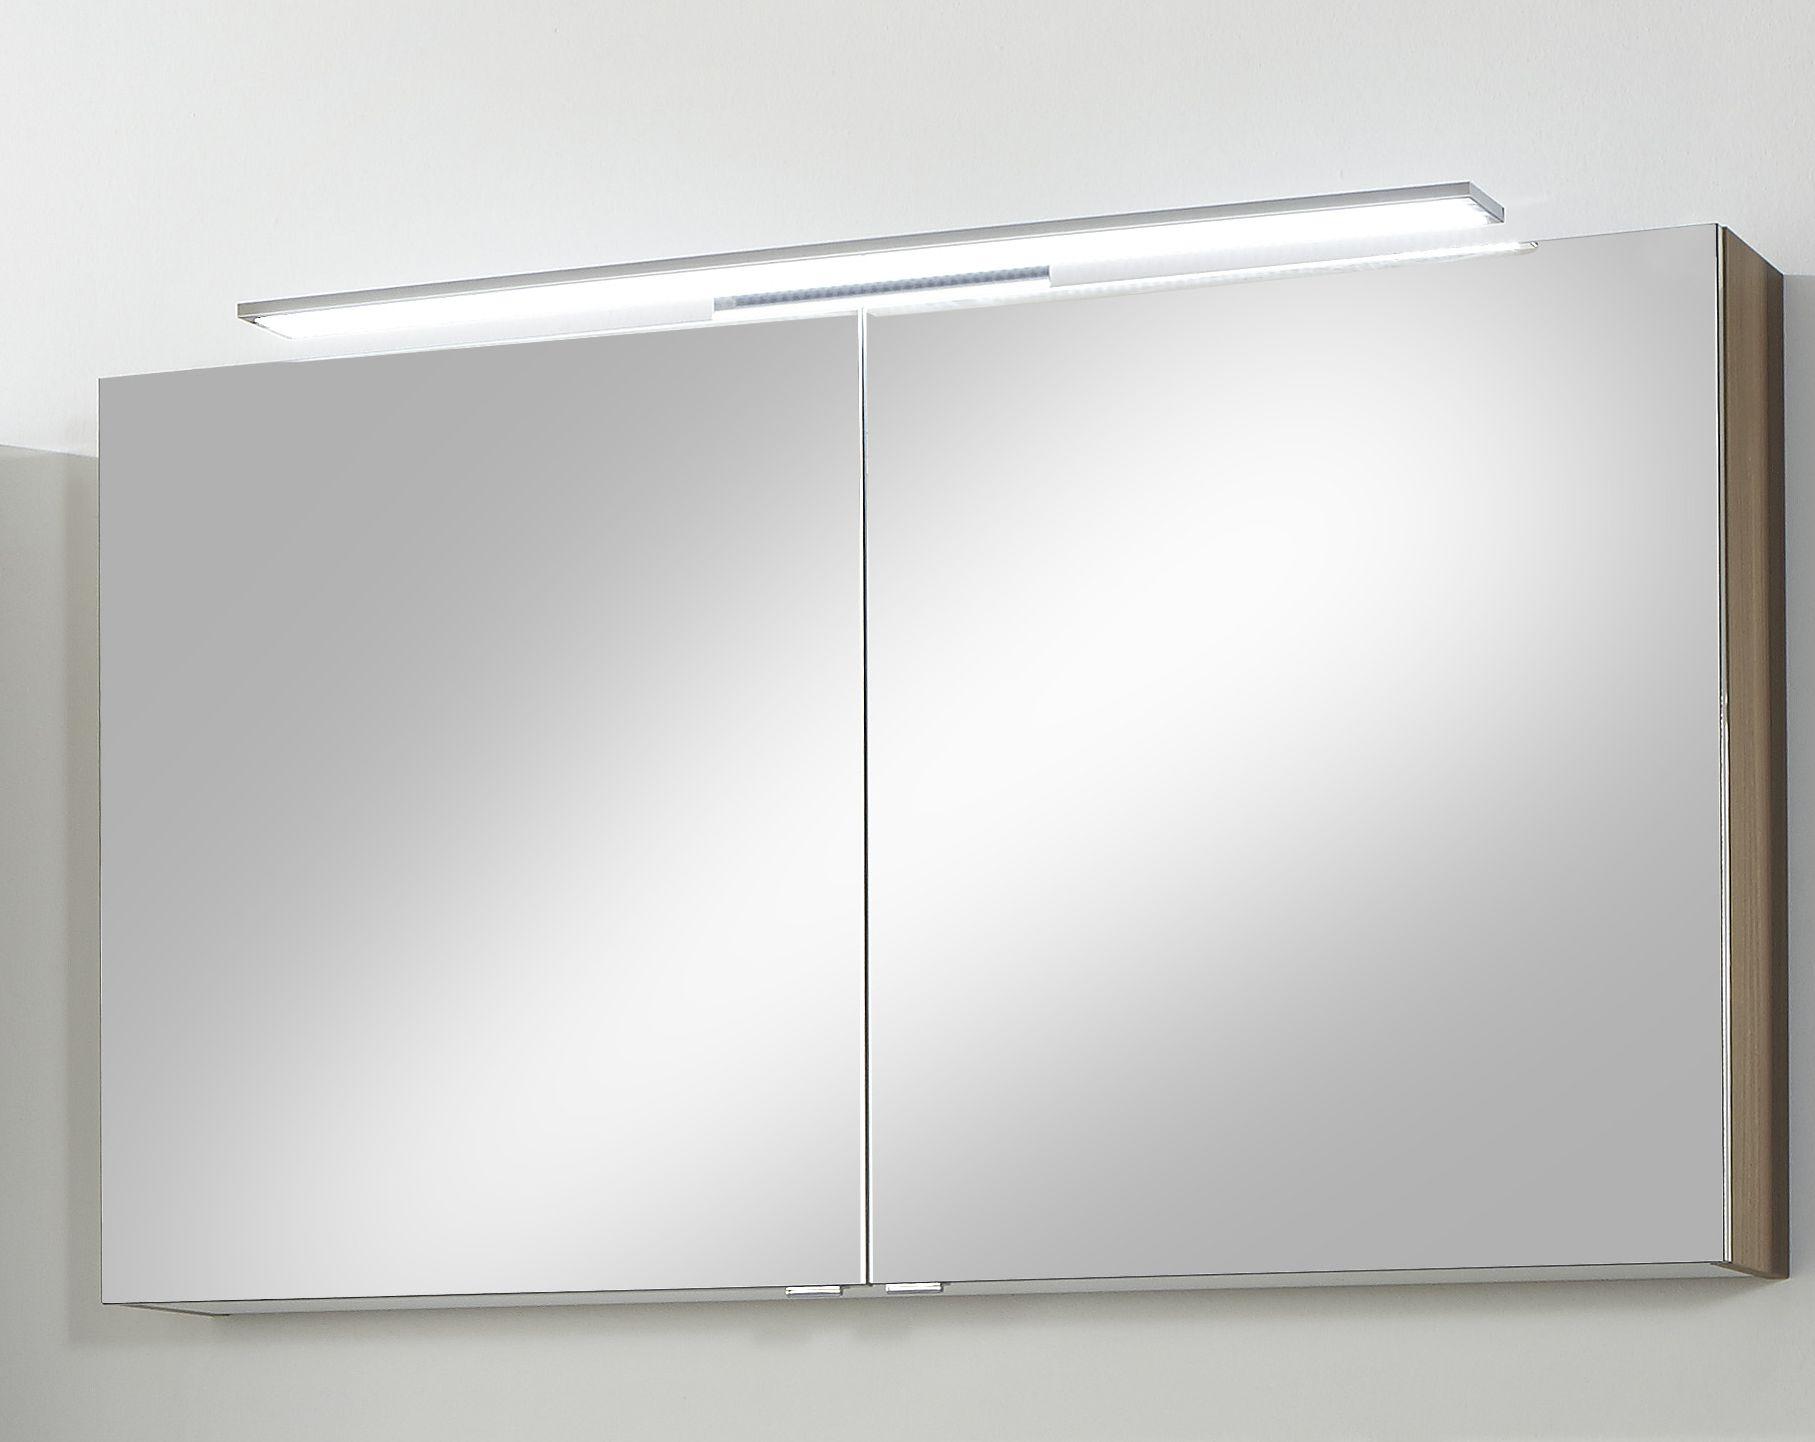 marlin bad 3090 cosmo spiegelschrank 120 cm ssfgs66 g nstig kaufen m bel universum. Black Bedroom Furniture Sets. Home Design Ideas